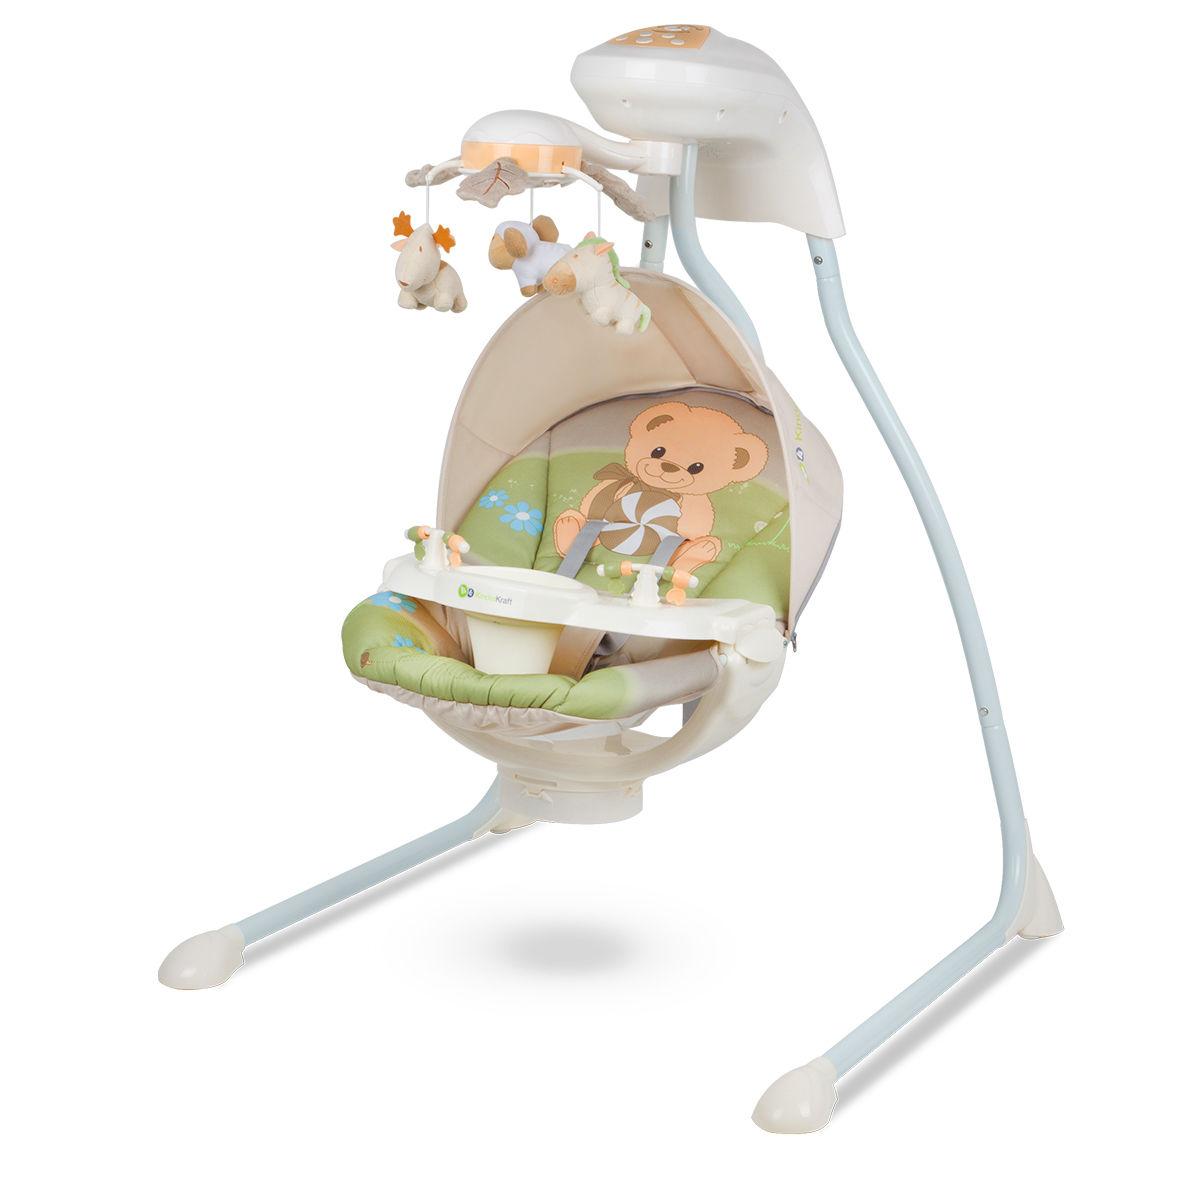 kinderkraft teddy bear babywippe babyschaukel wippe schaukel babytrage babysitz. Black Bedroom Furniture Sets. Home Design Ideas